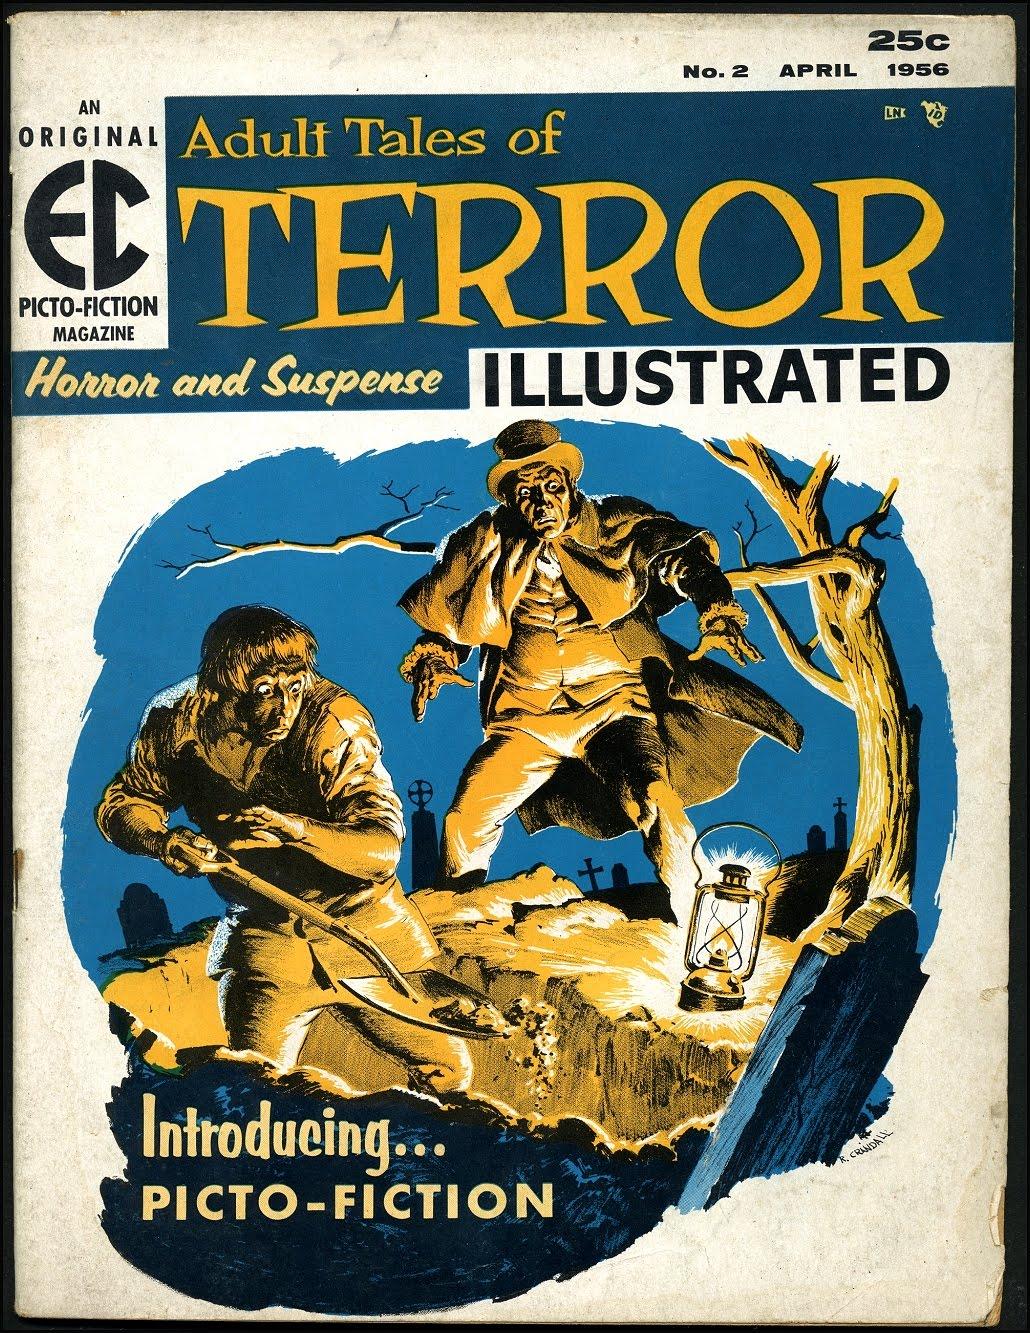 http://2.bp.blogspot.com/-r5ma-ogKW20/T1bC27bmVYI/AAAAAAABmQU/af4n3DN3chE/s1600/1956_terror_02_crandall.jpg